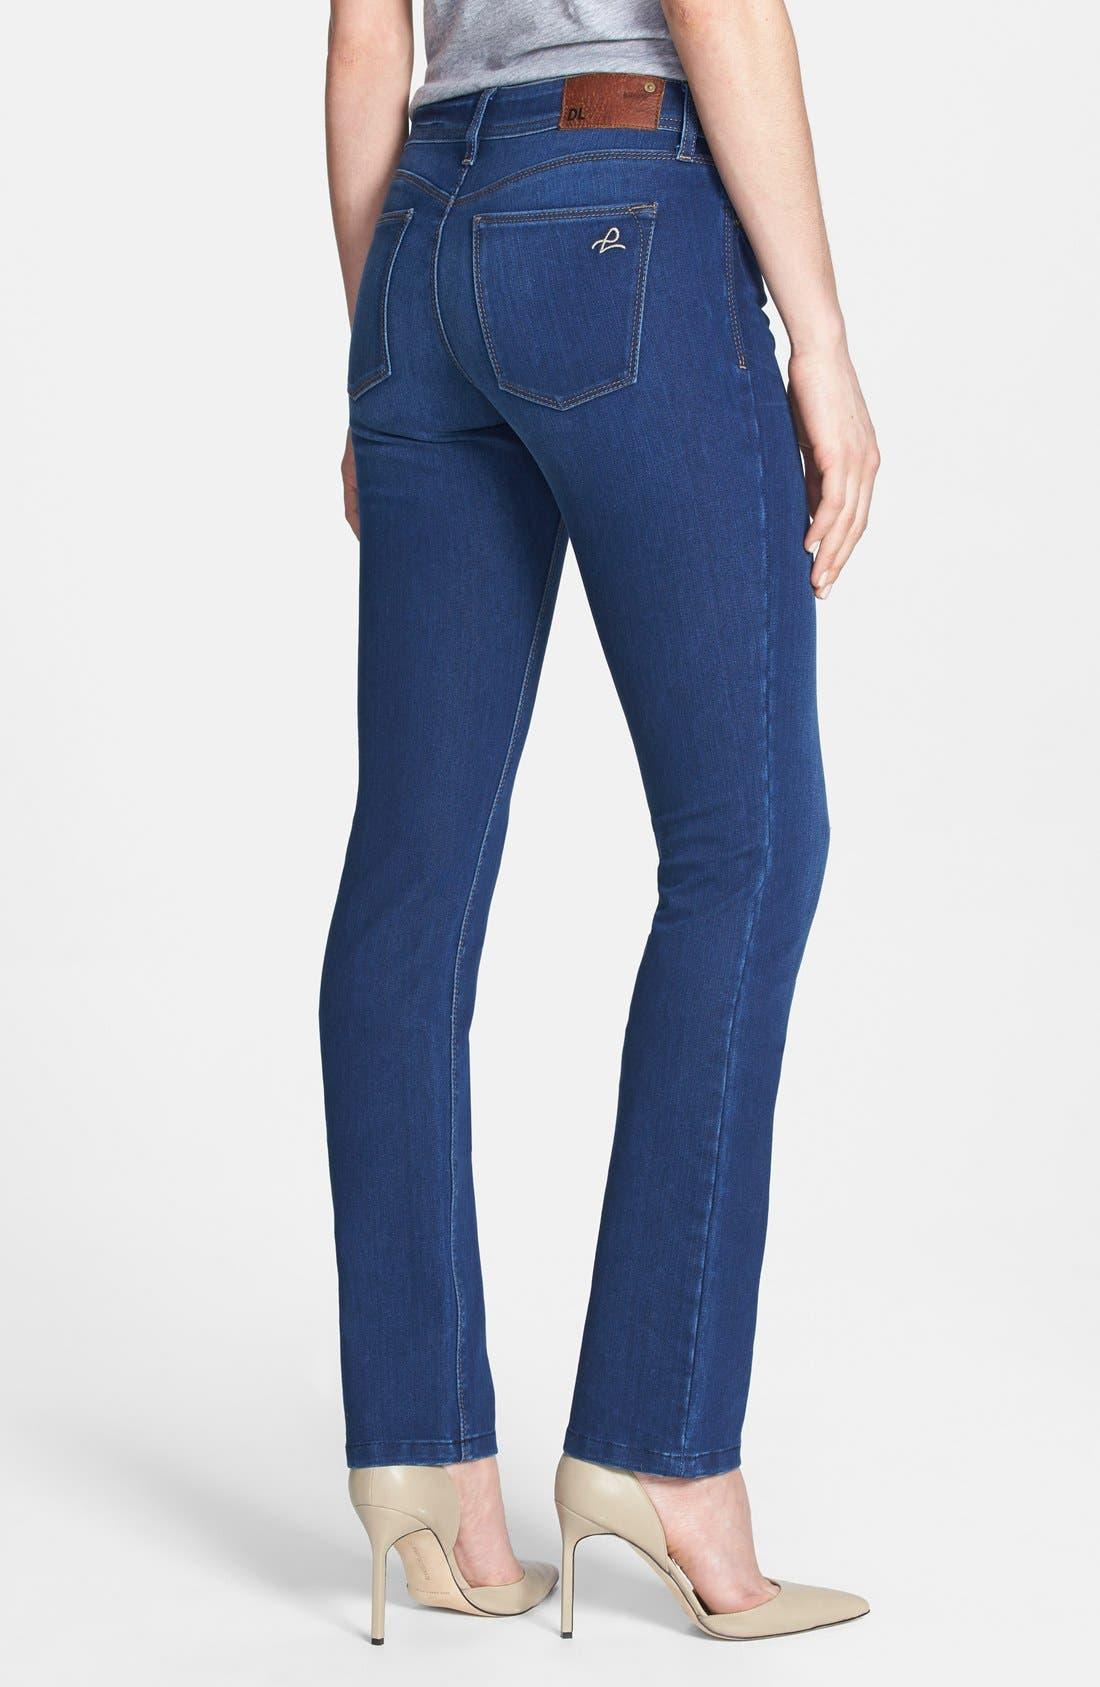 Alternate Image 2  - DL1961 'Grace' Straight Jeans (Dyer)